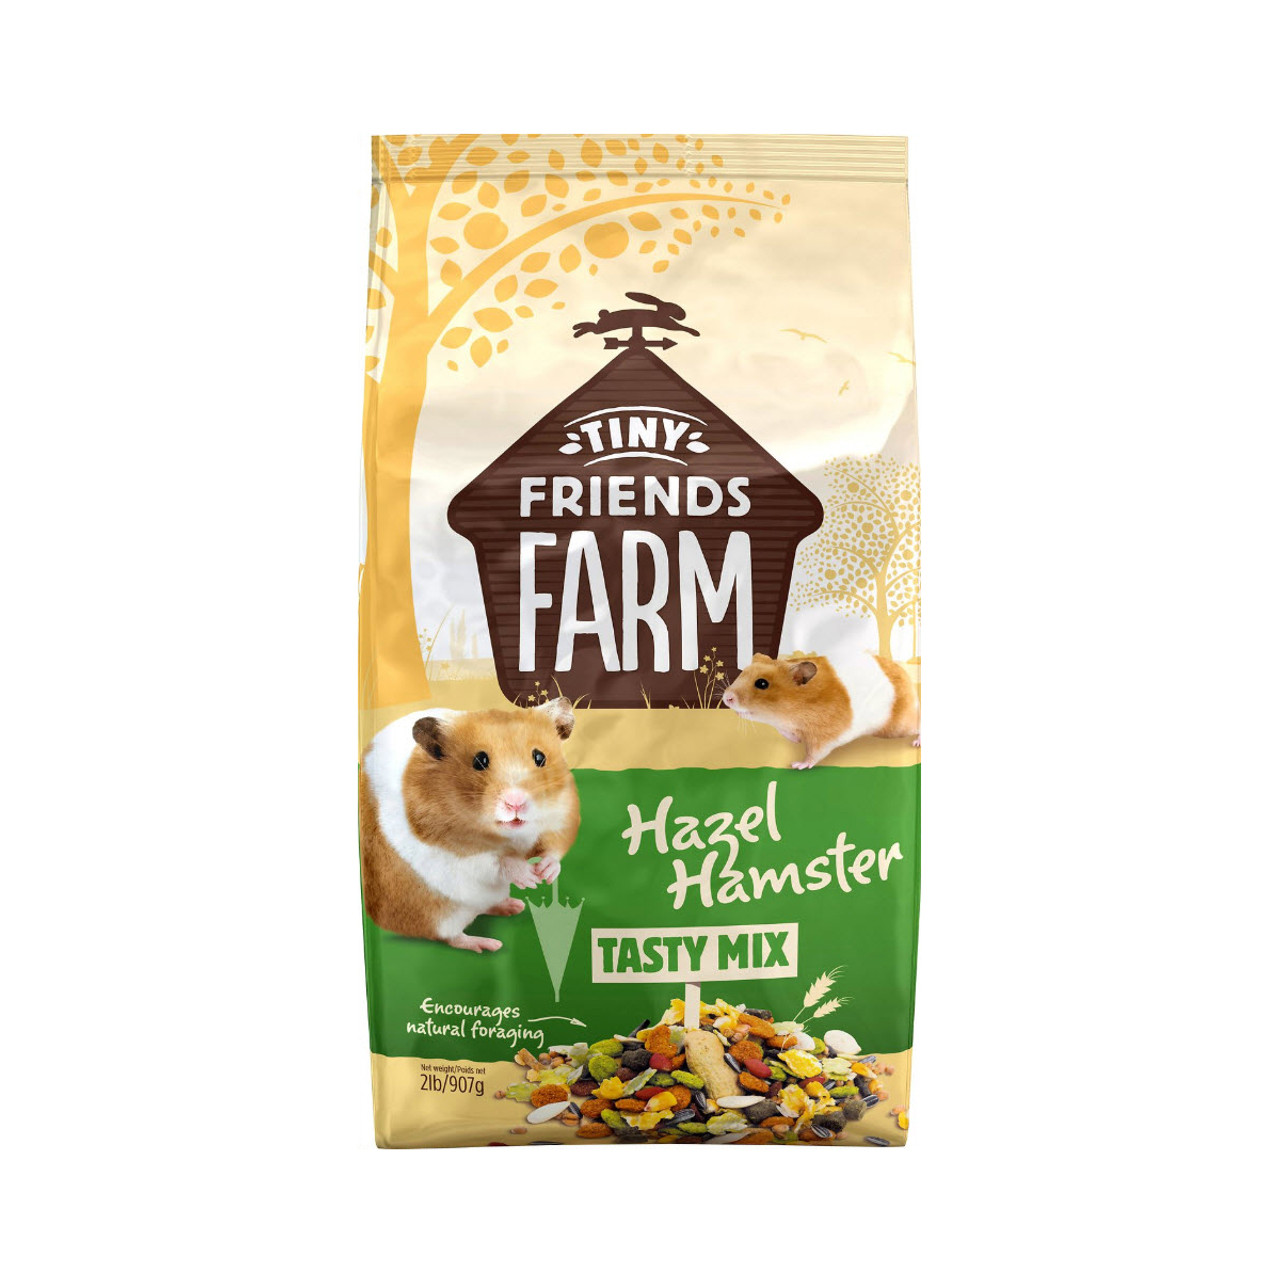 Tiny Friends Farm Hazel Hamster Tasty Mix Food